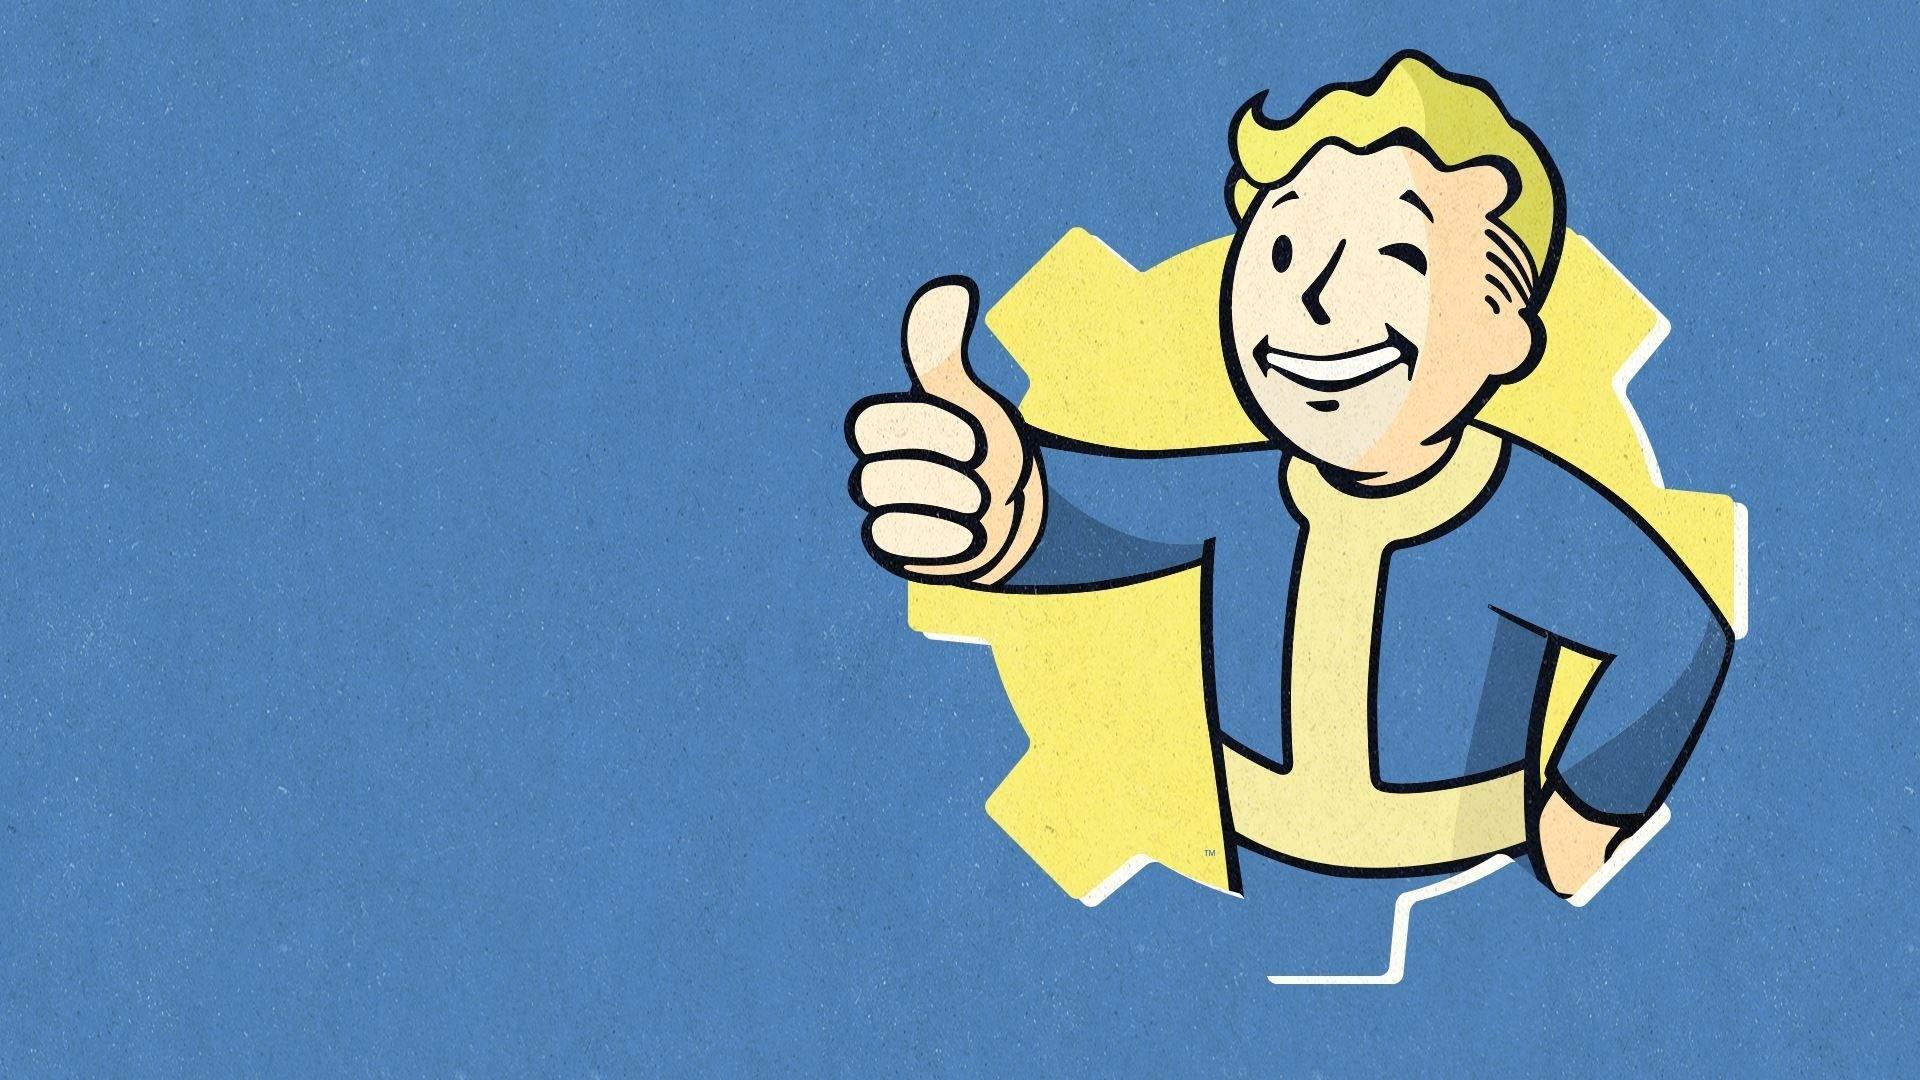 Fondos de pantalla de Fallout 4, Wallpapers HD Gratis